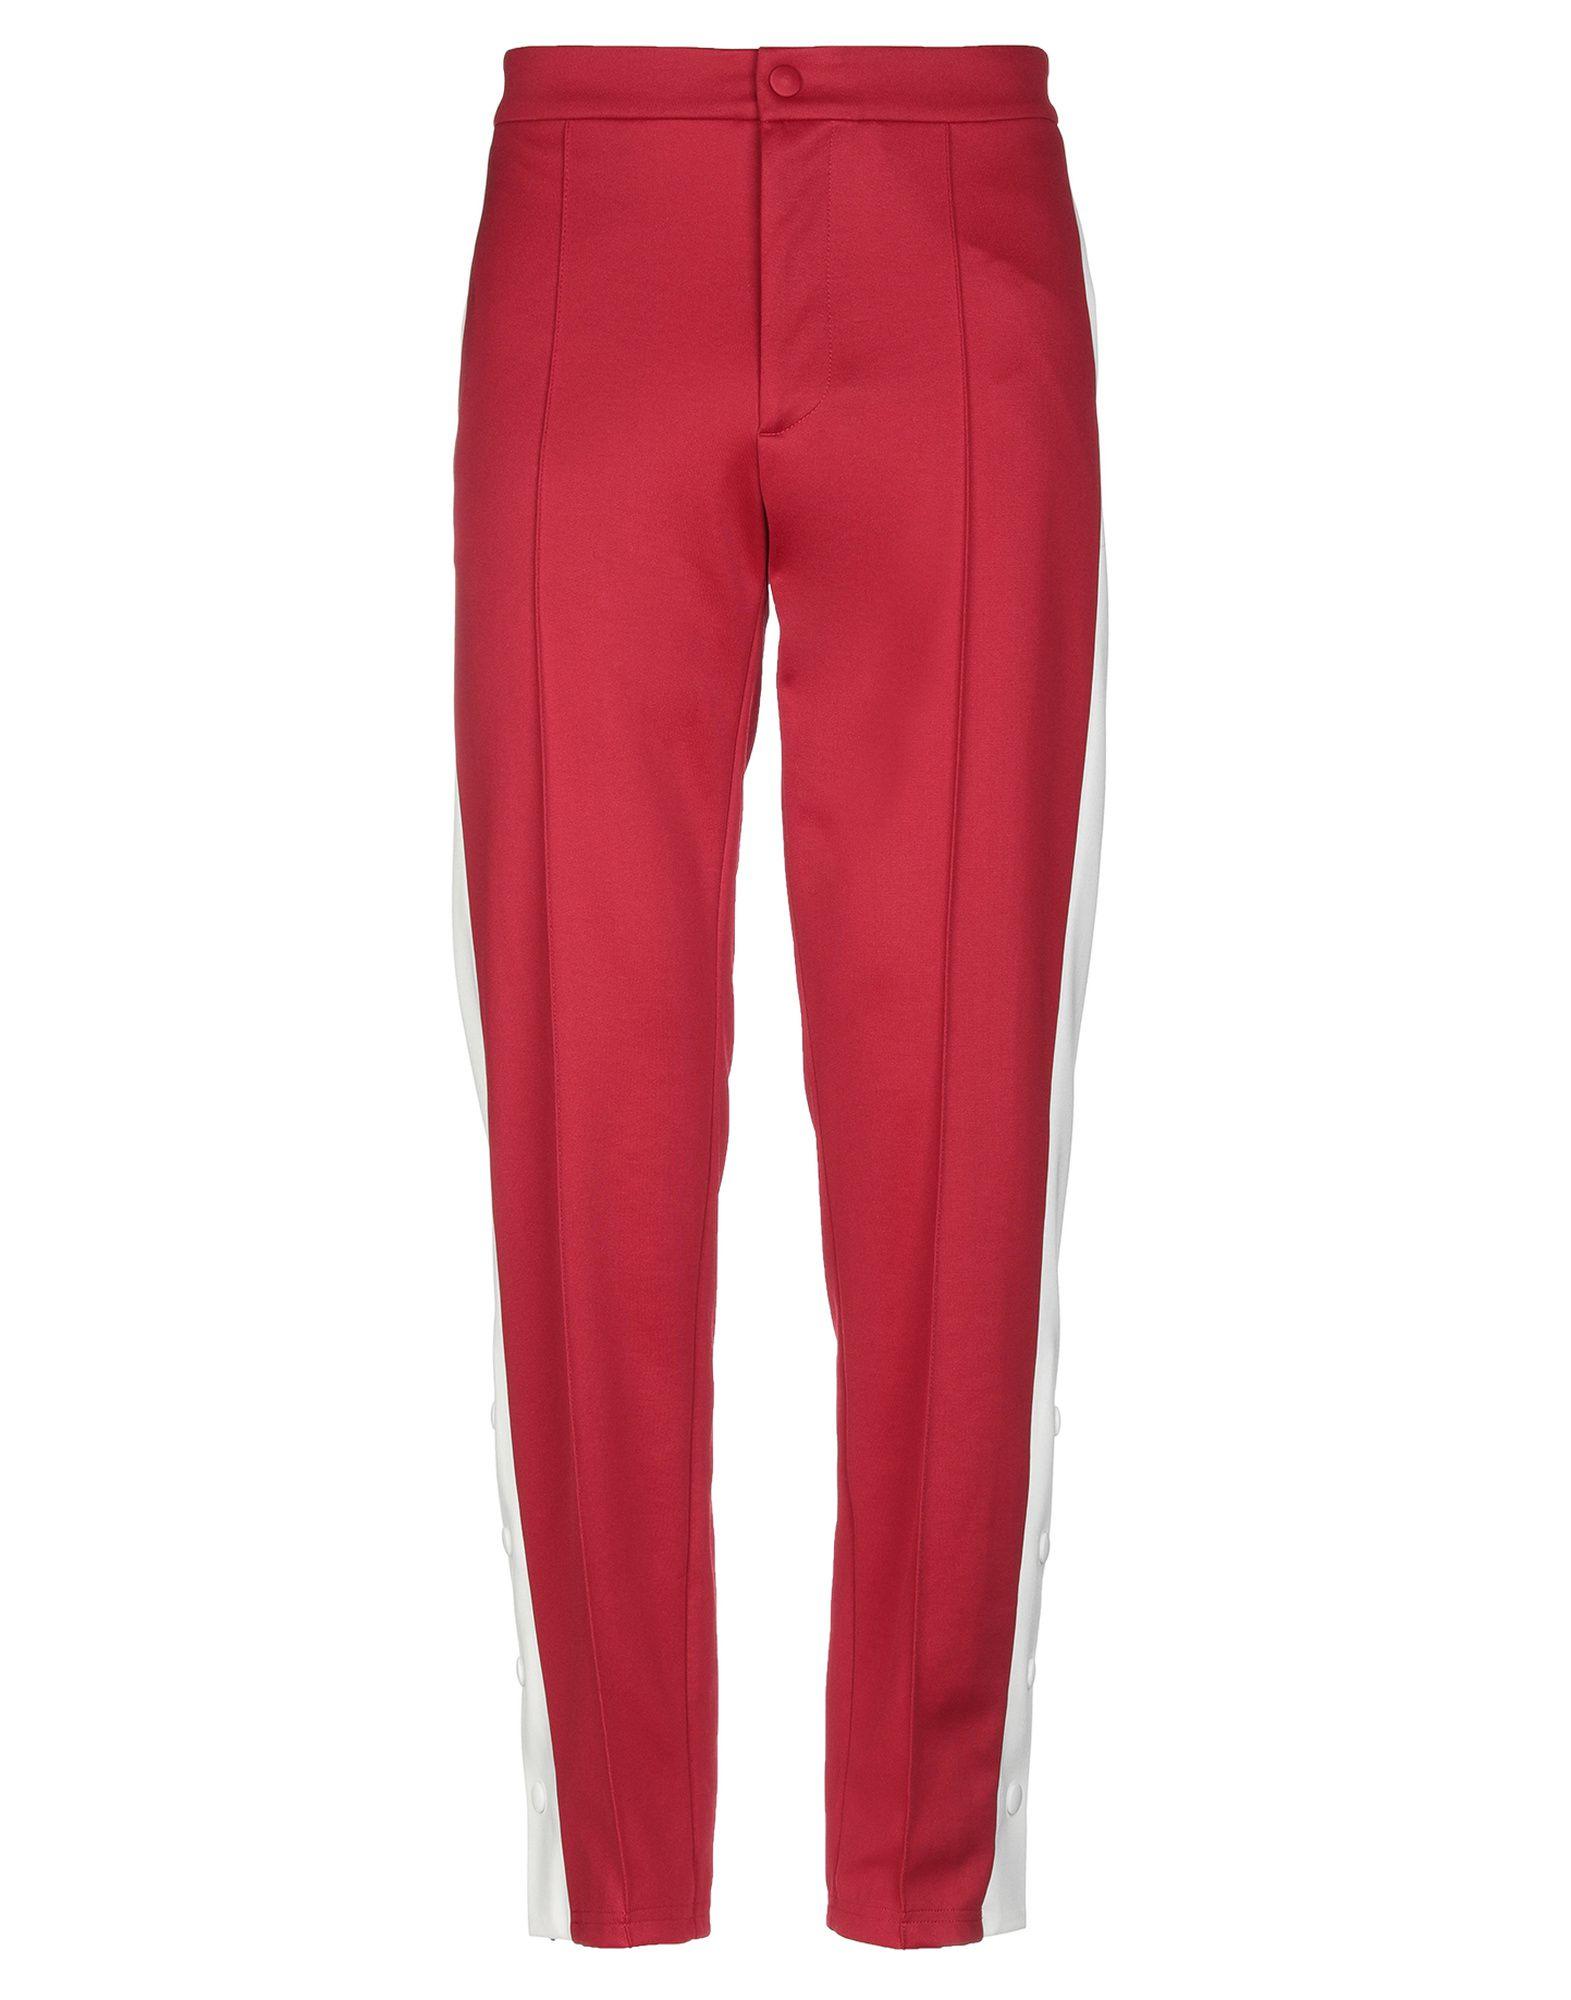 Pantalone Valentino uomo uomo - 13286341XN  Online zum besten Preis